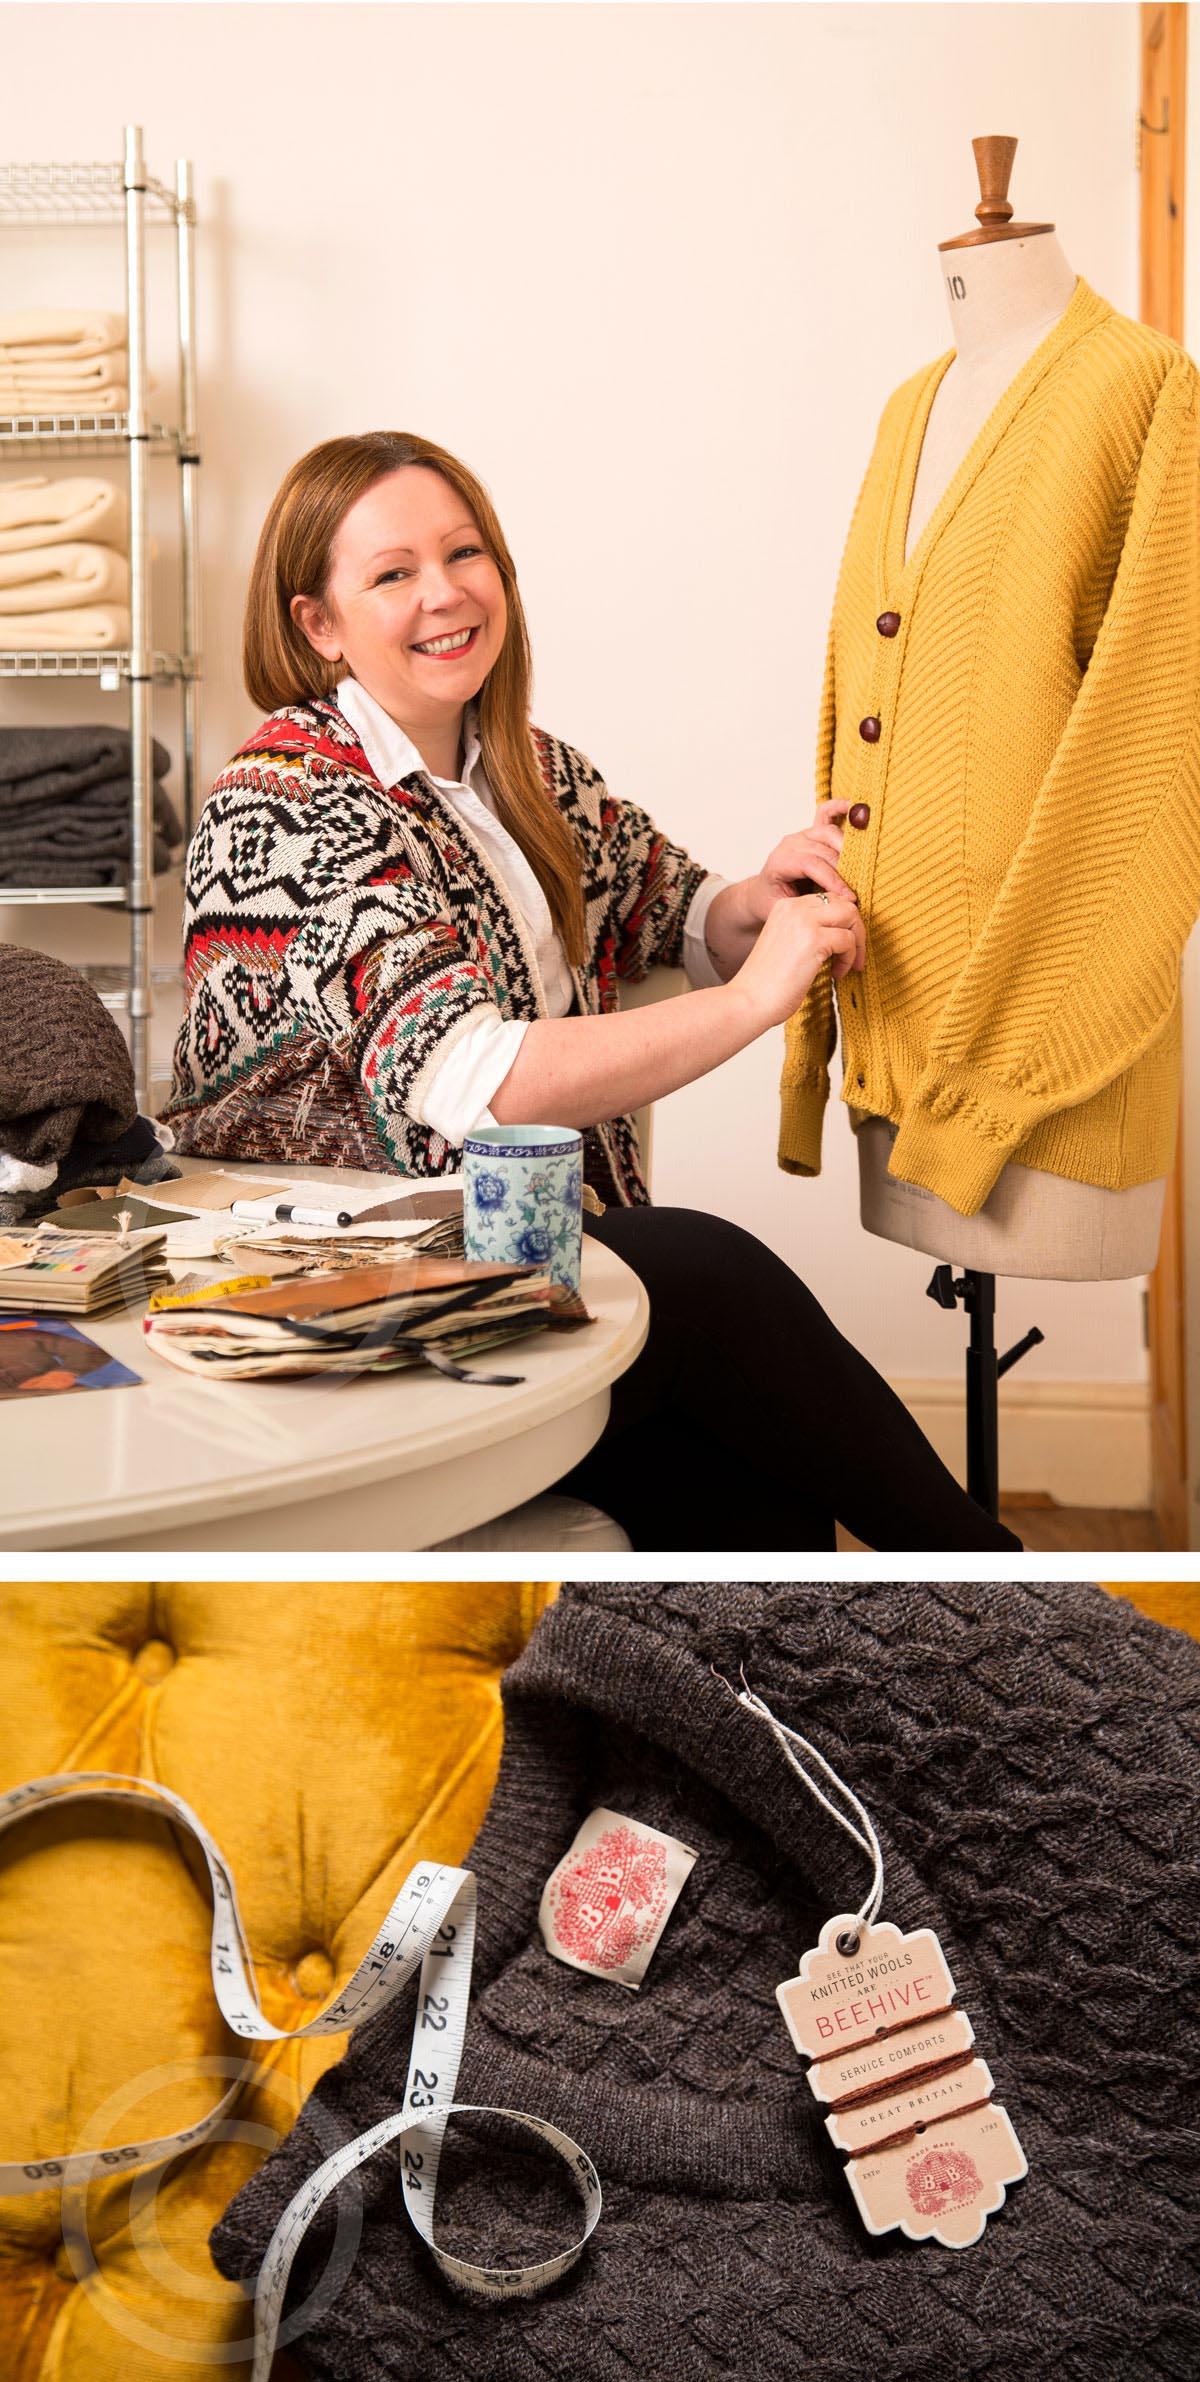 Beehive-knitware-andrea-prima-magazine-yorkshire-north-darlington-editorial